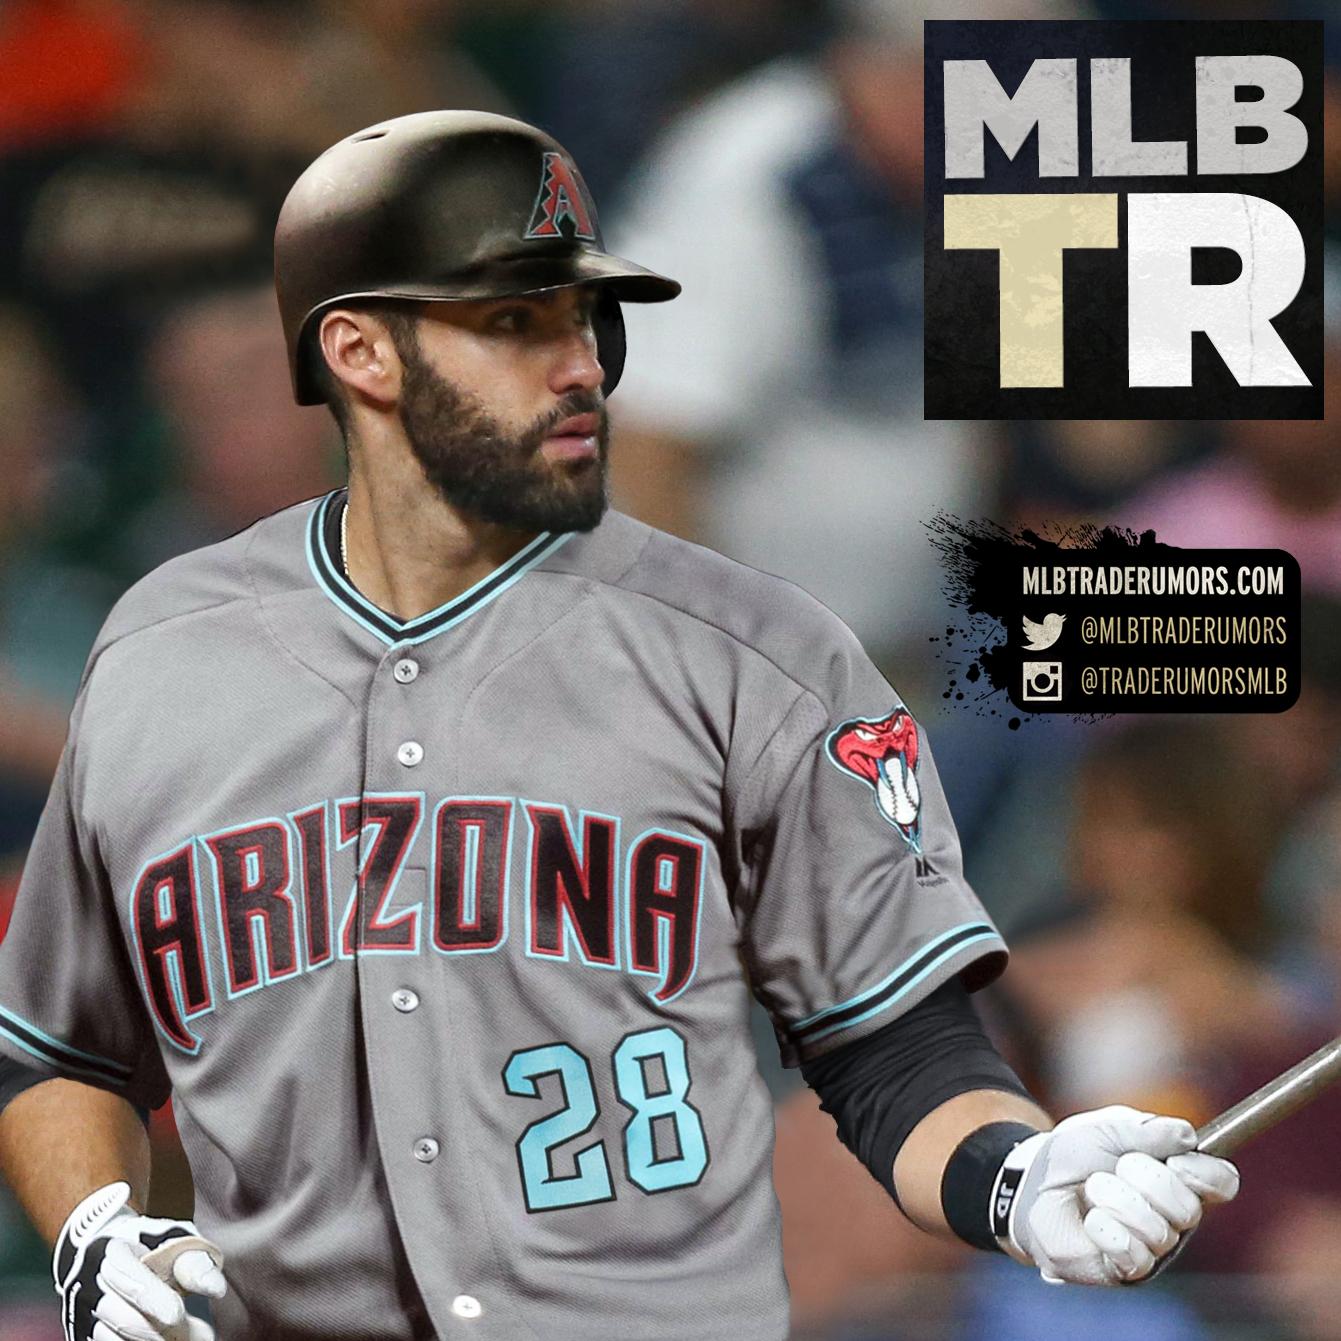 Diamondbacks Acquire J.D. Martinez - MLB Trade Rumors f45d9eaed6a